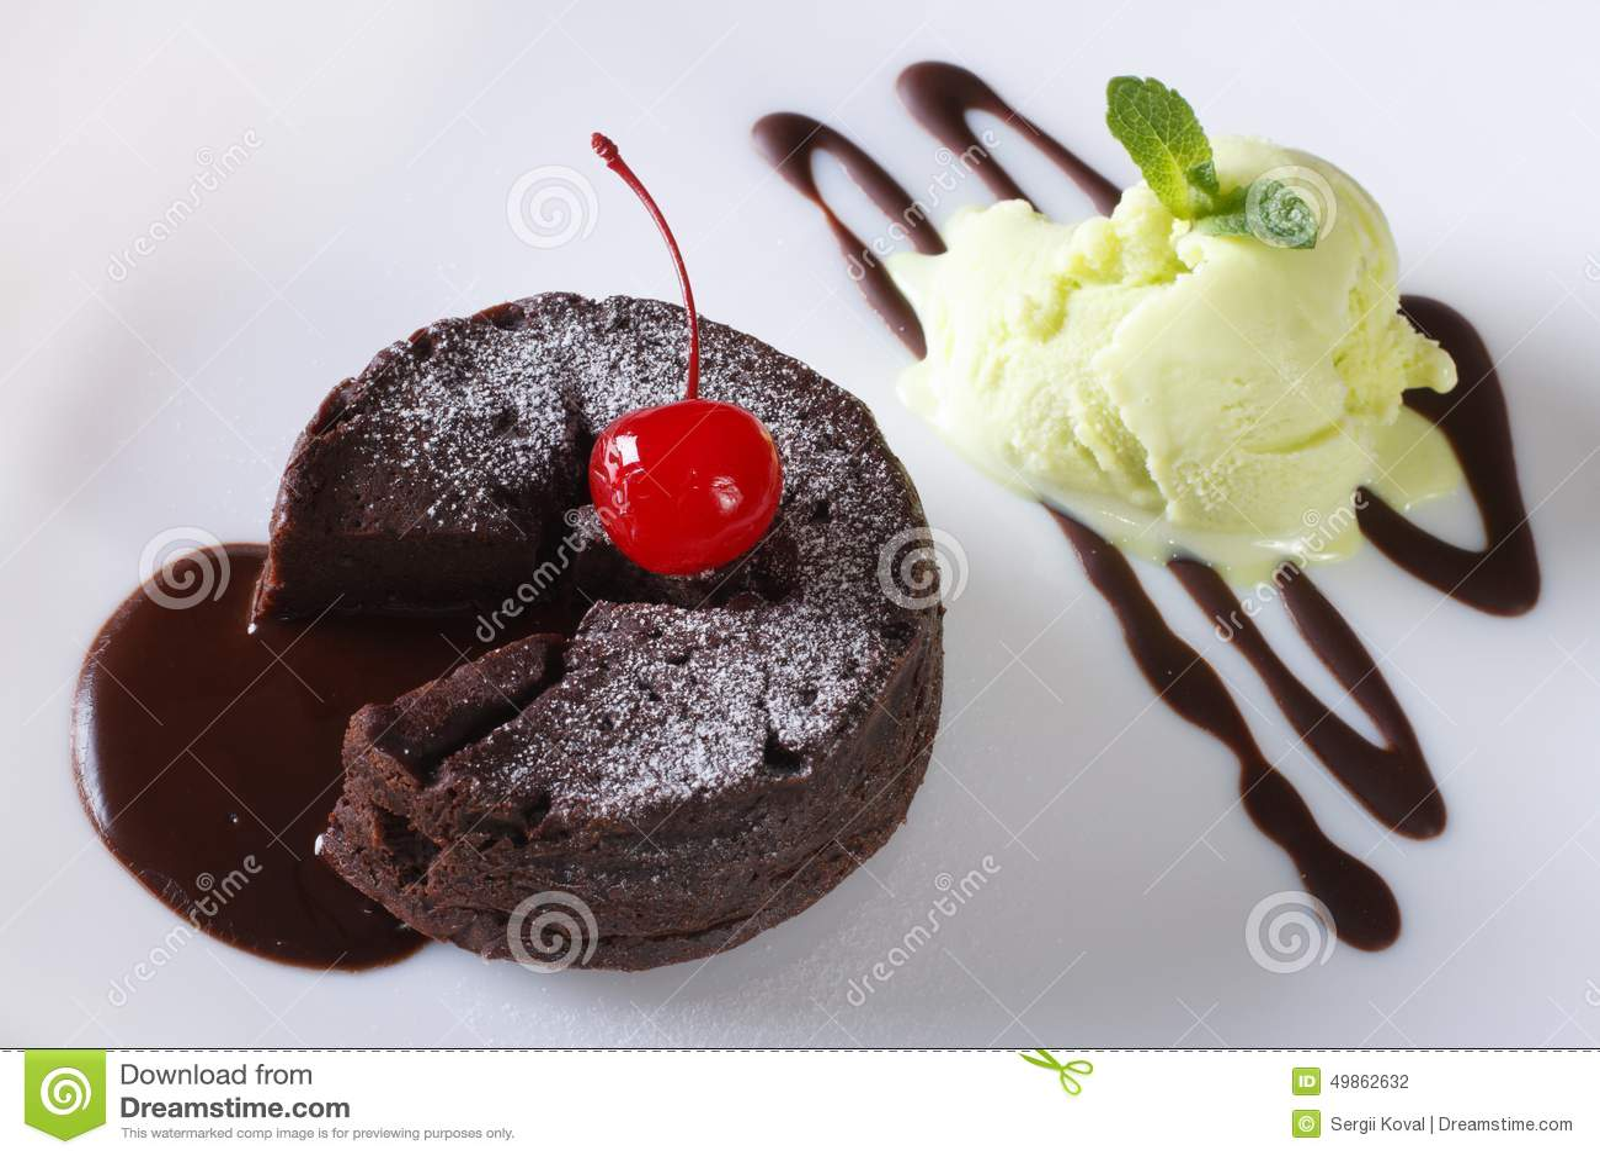 Chocolate Fondant And Ice Cream Stock Photo - Image: 81675253